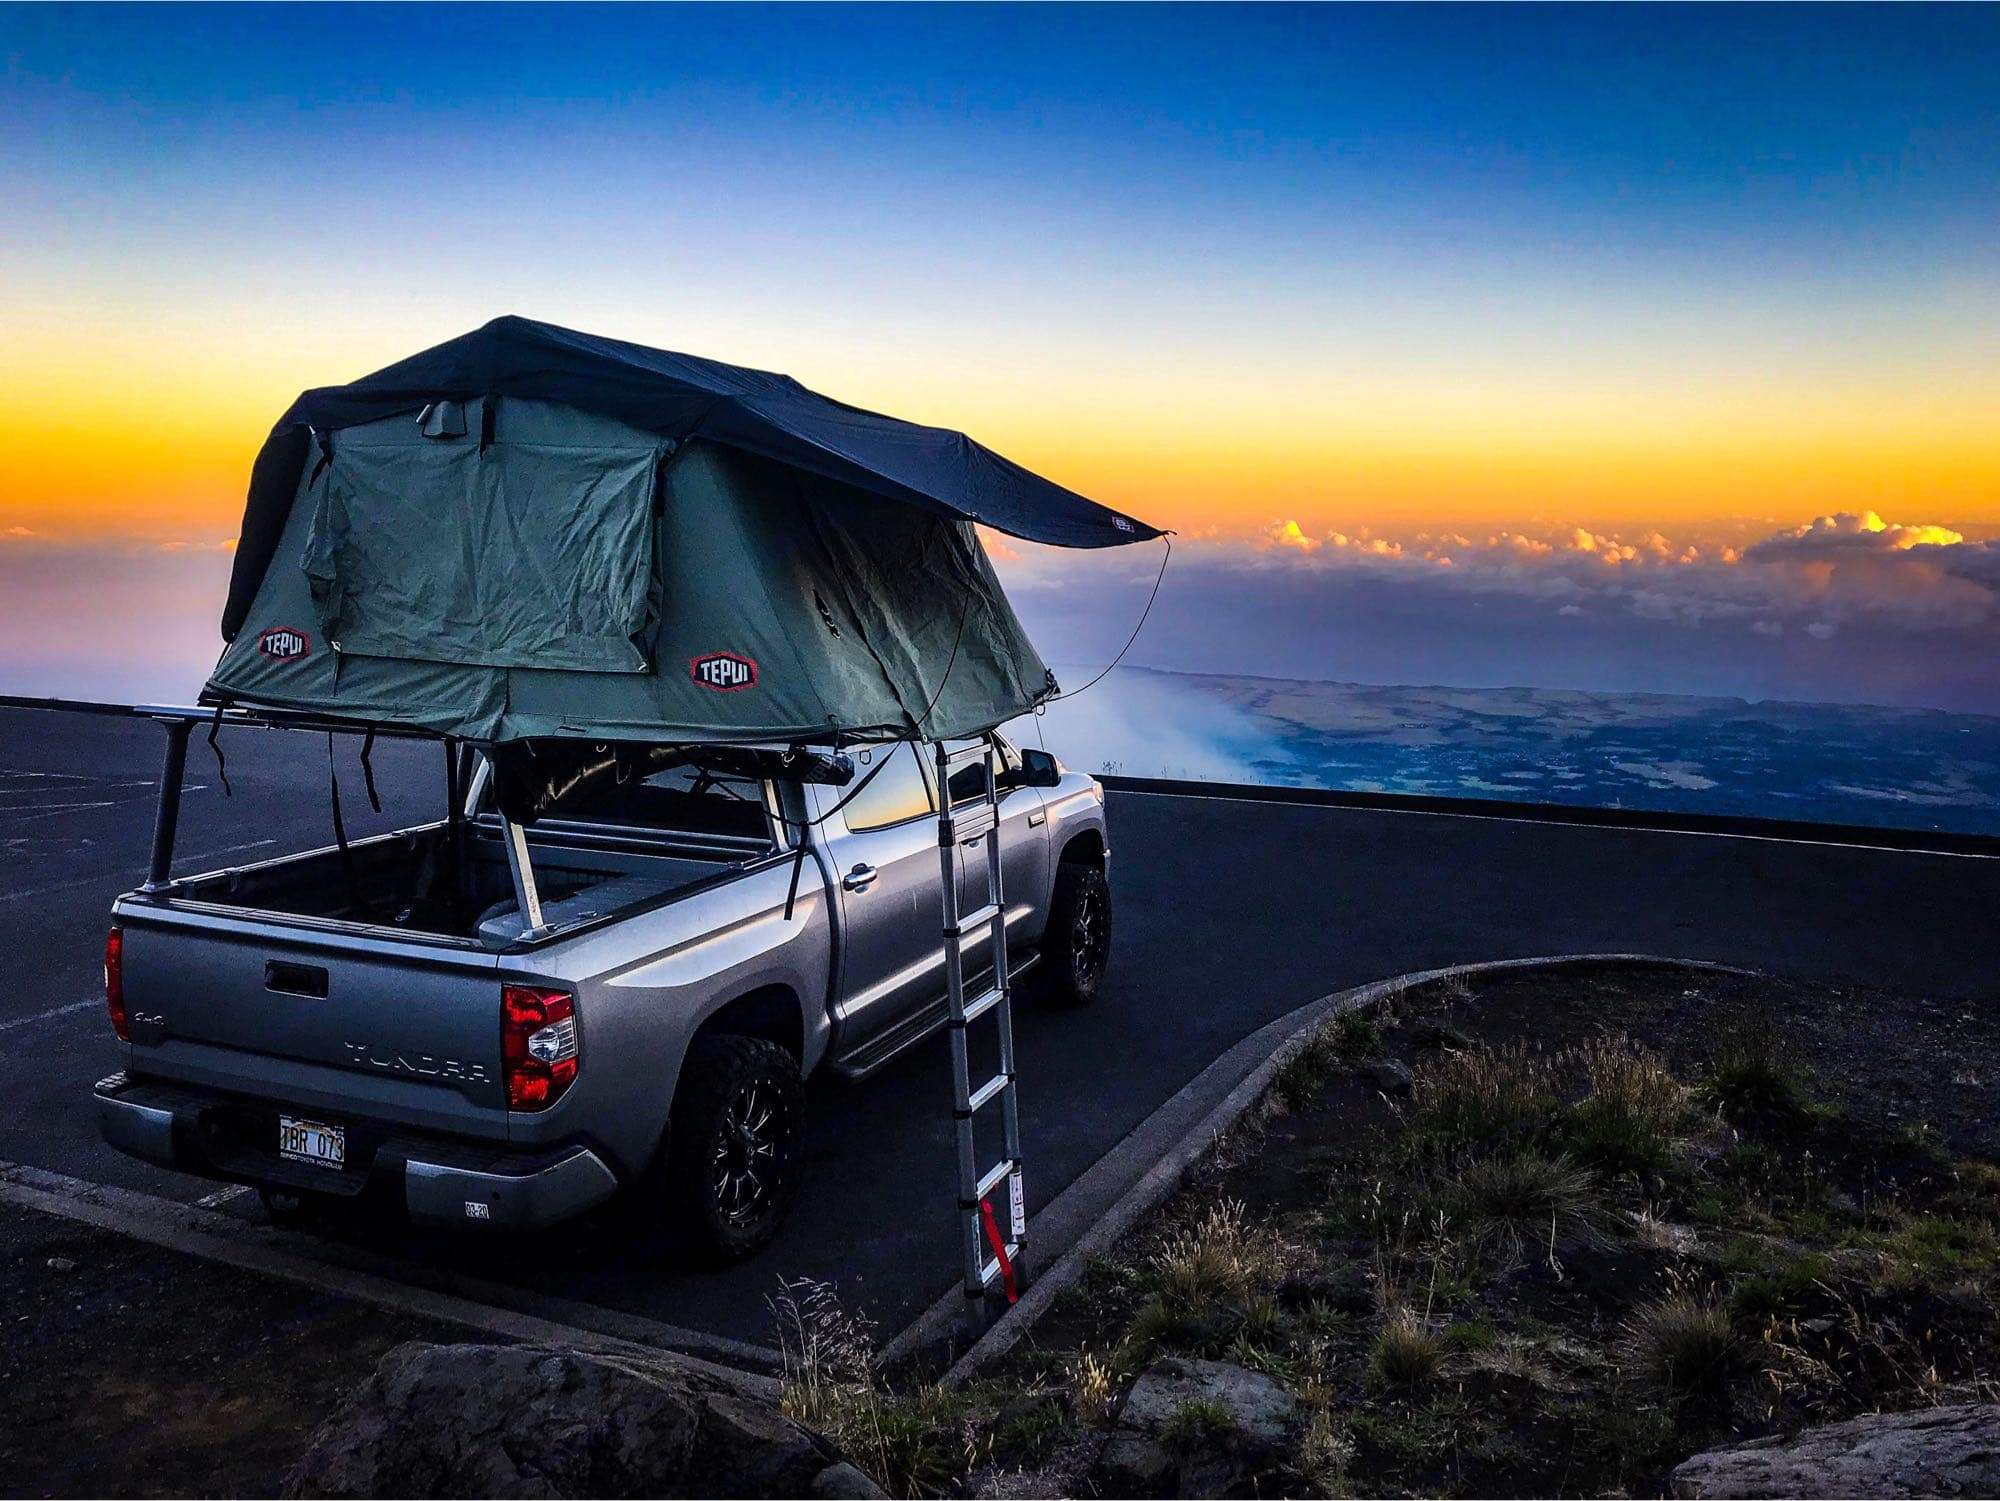 Haleakala sunrise on a cool morning, so beautiful up there.. Toyota Tundra 2017